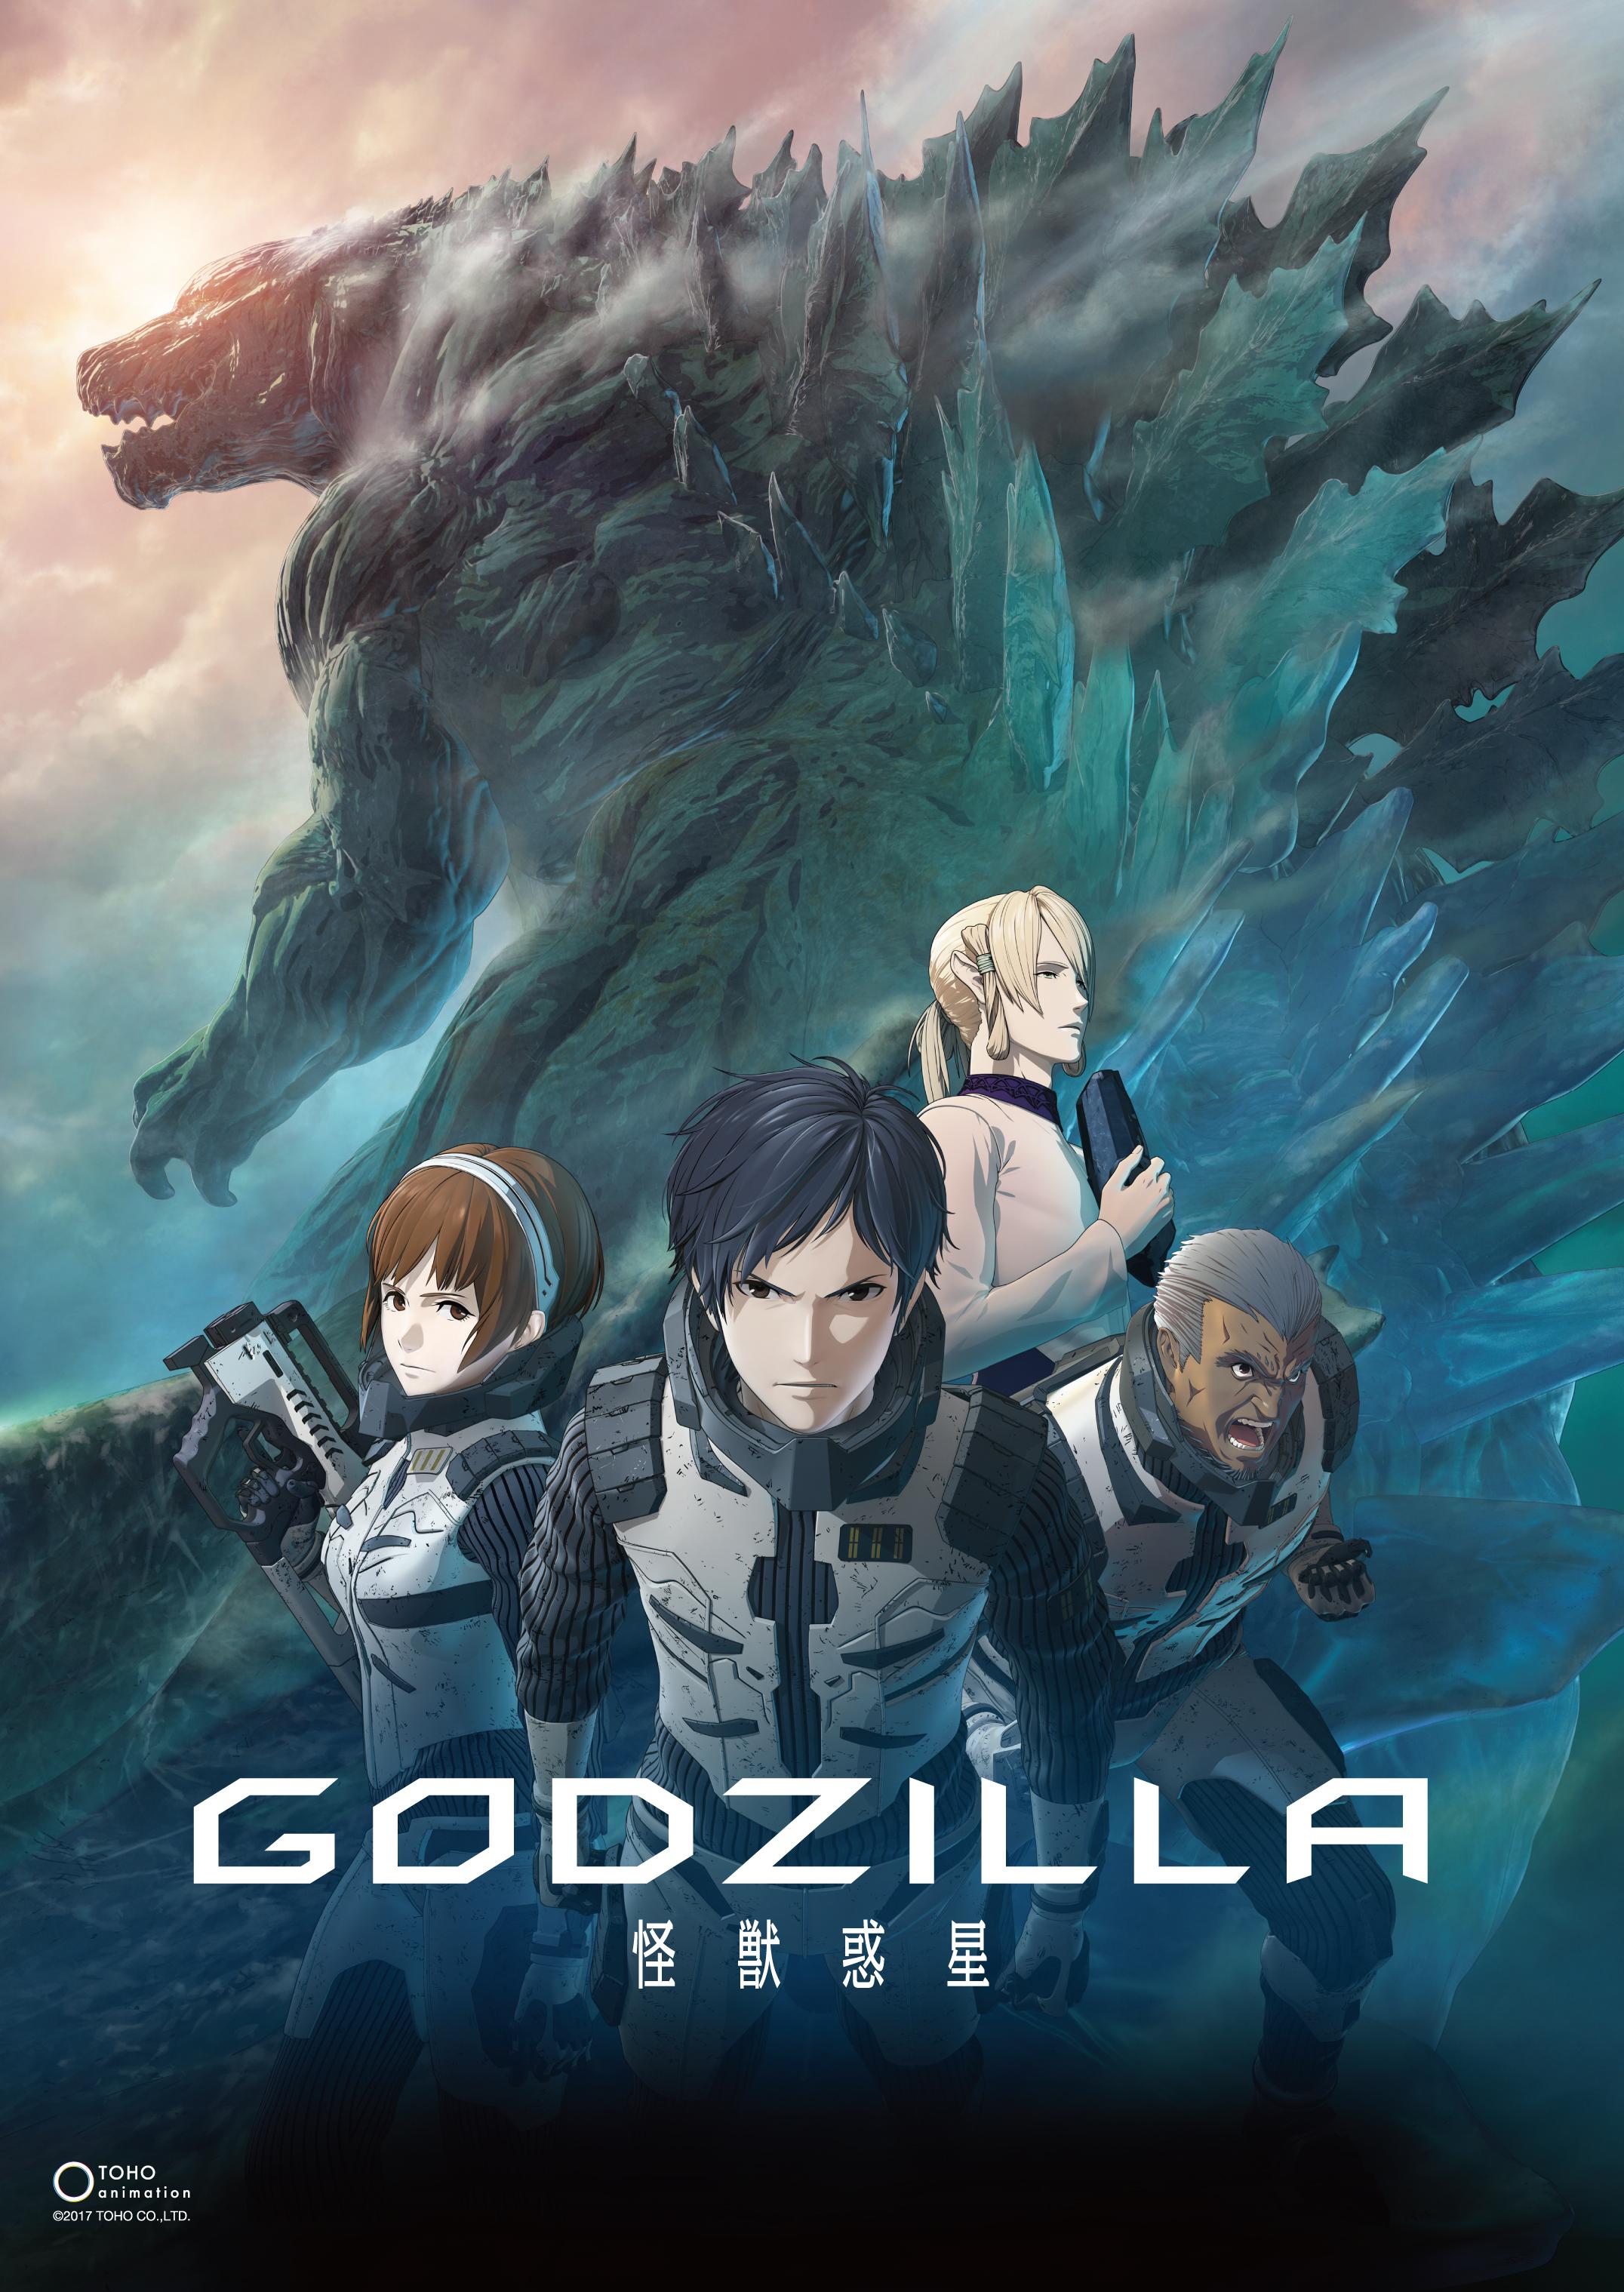 Godzilla: Planeta de monstruos